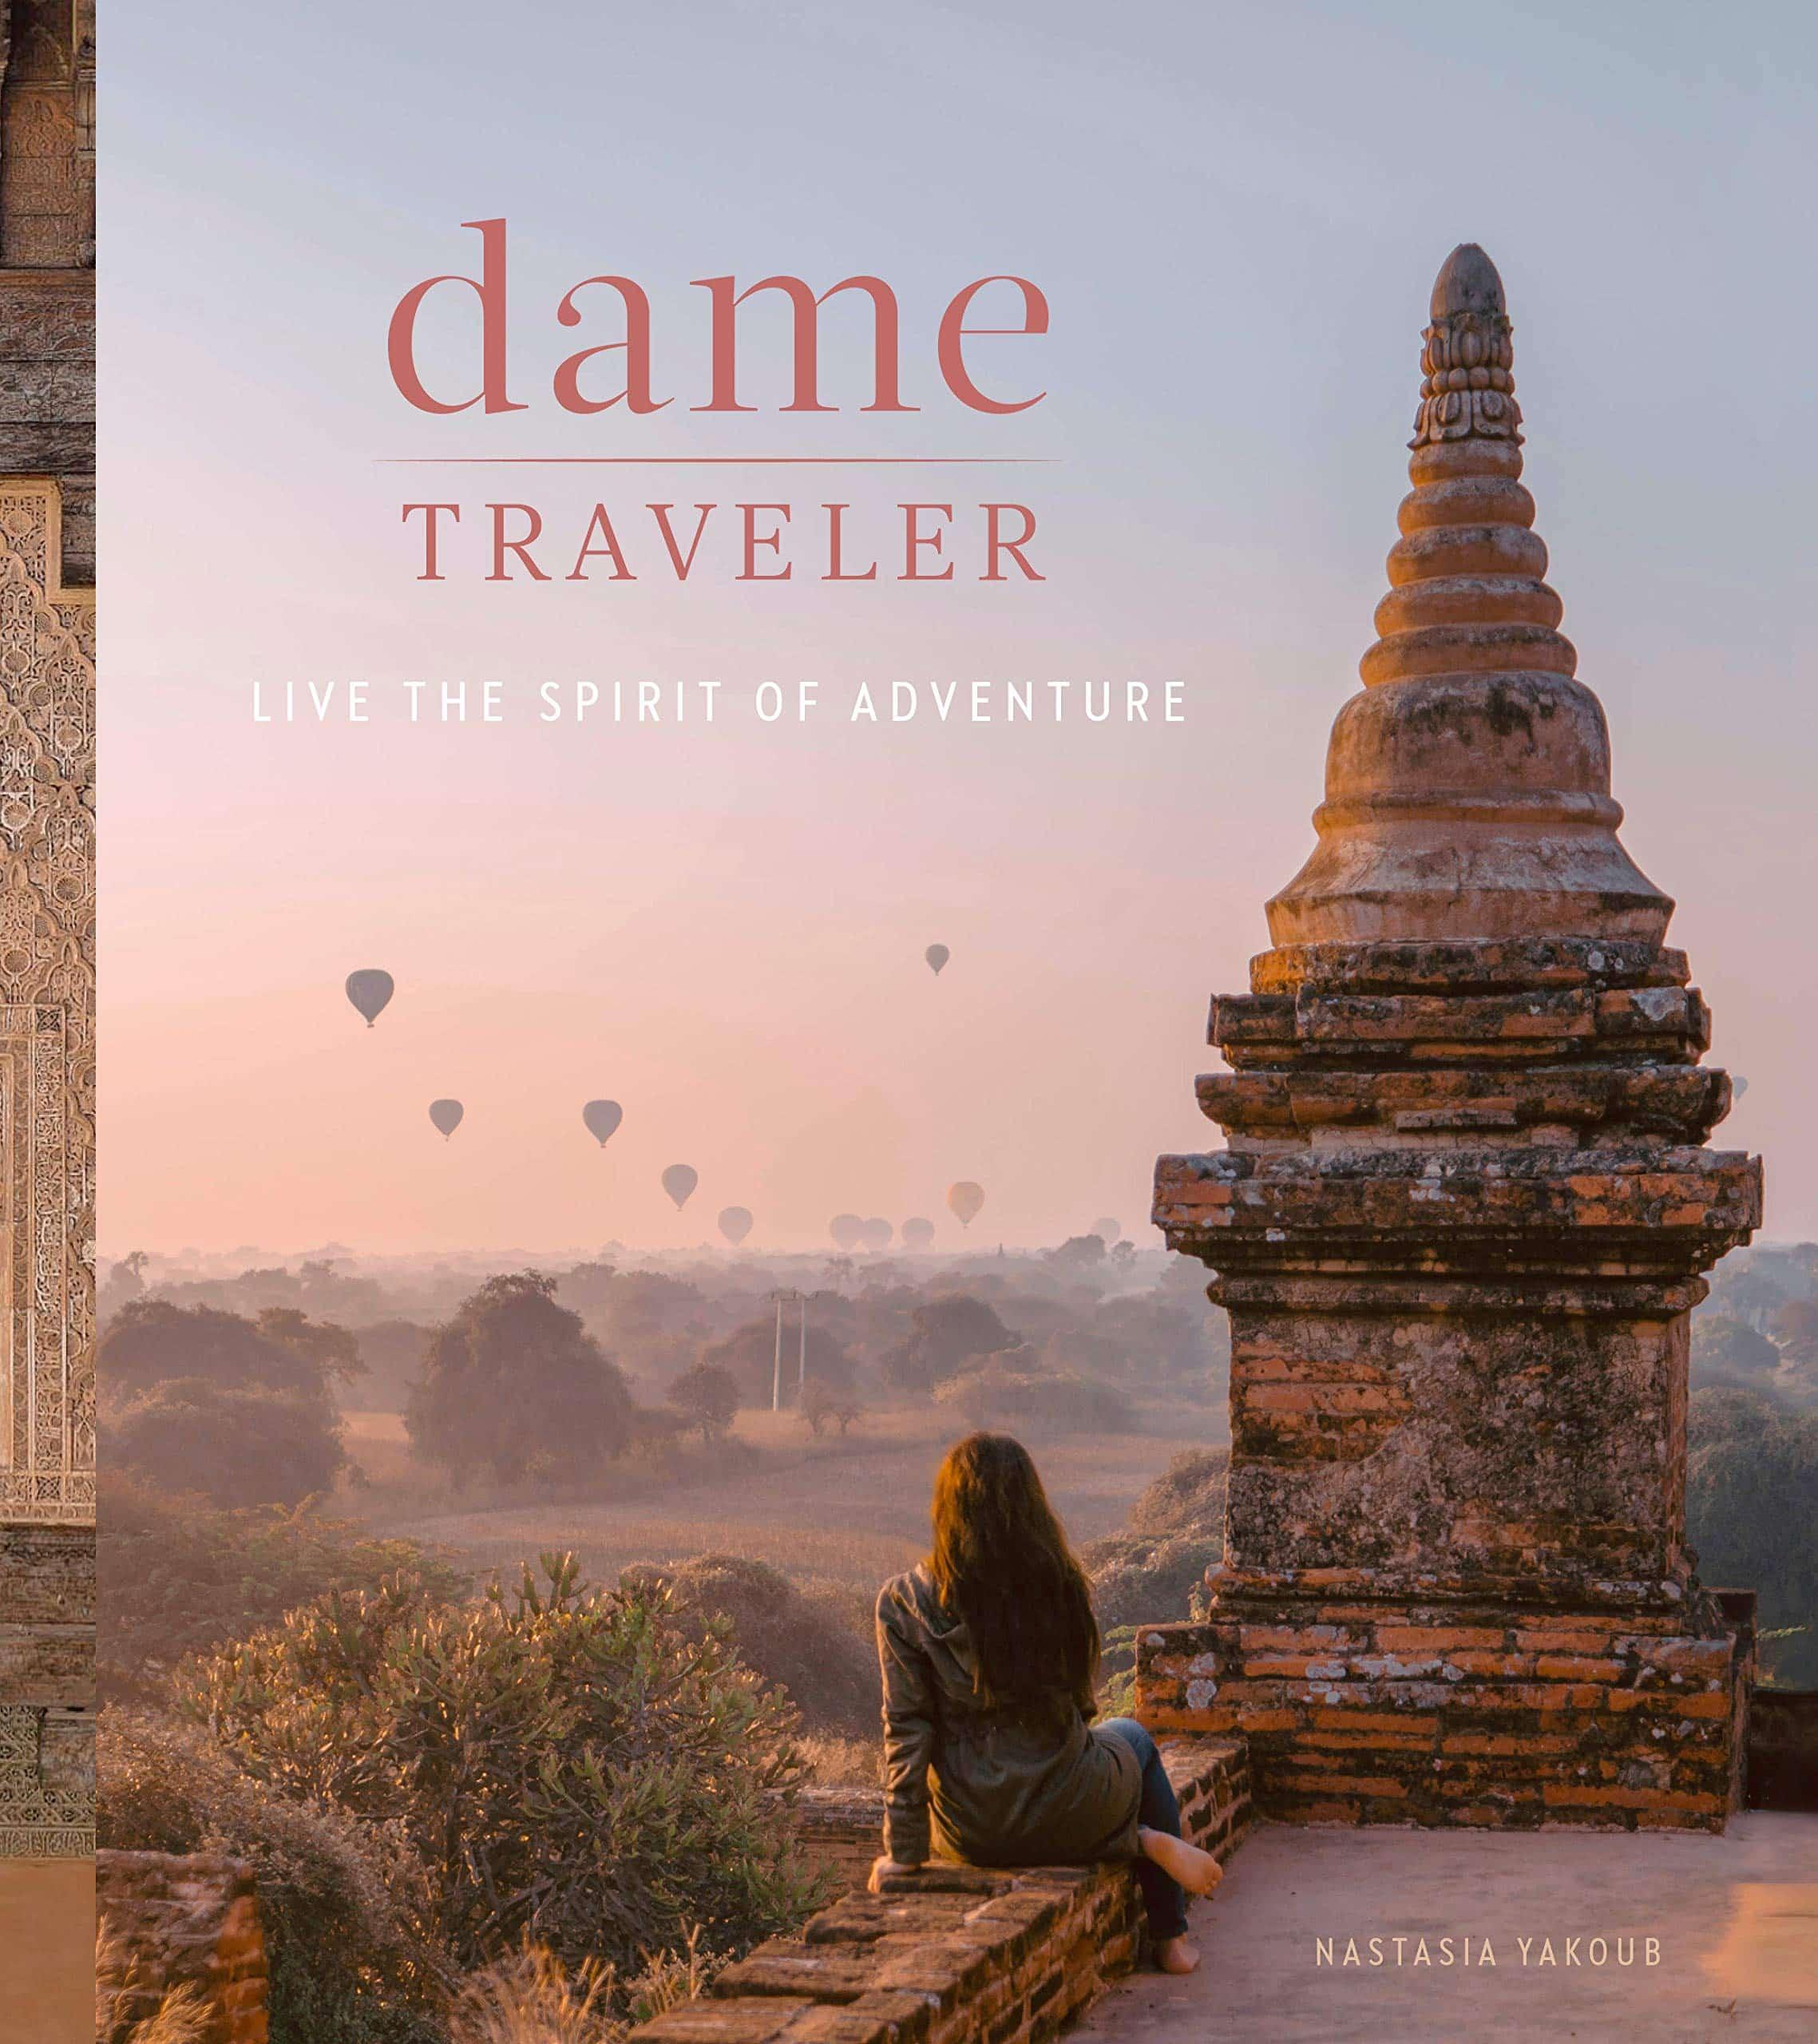 travel-gifts-for-women-inspiring-book